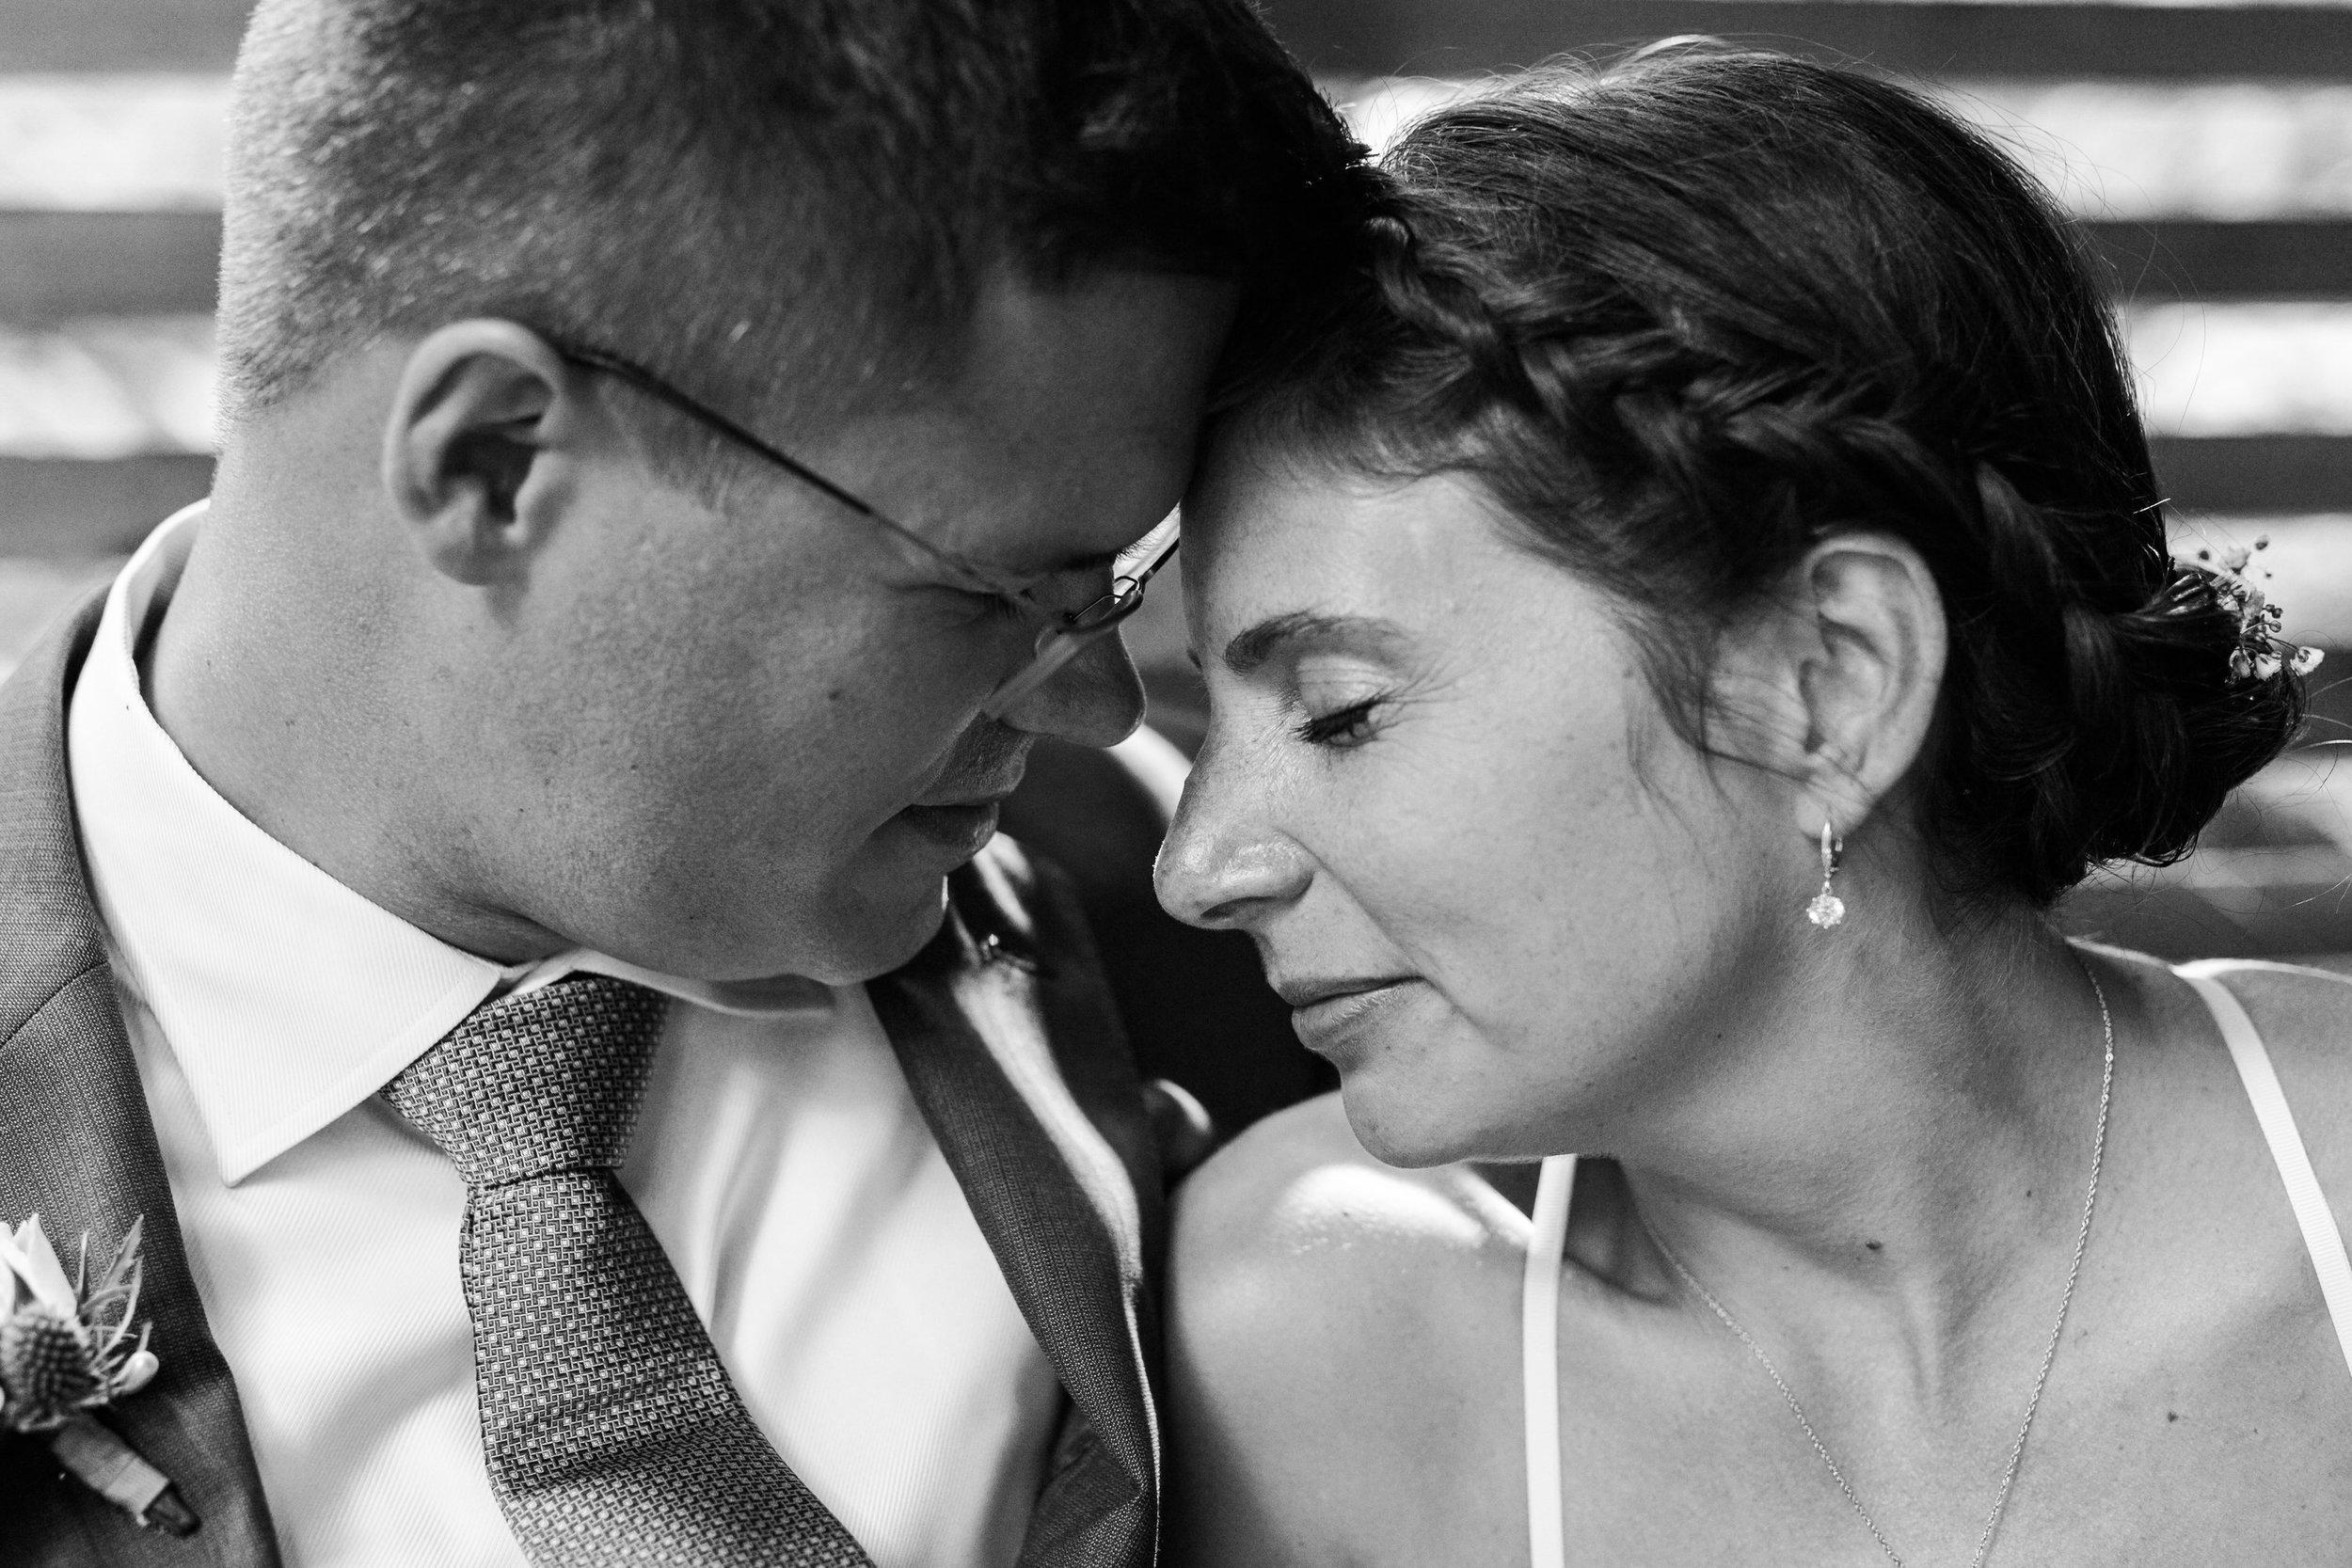 Camp Fircom Wedding - Vancouver Wedding Photographer & Videographer - Sunshine Coast Wedding Photos - Sunshine Coast Wedding Photographer - Jennifer Picard Photography - IMG_2066.jpg